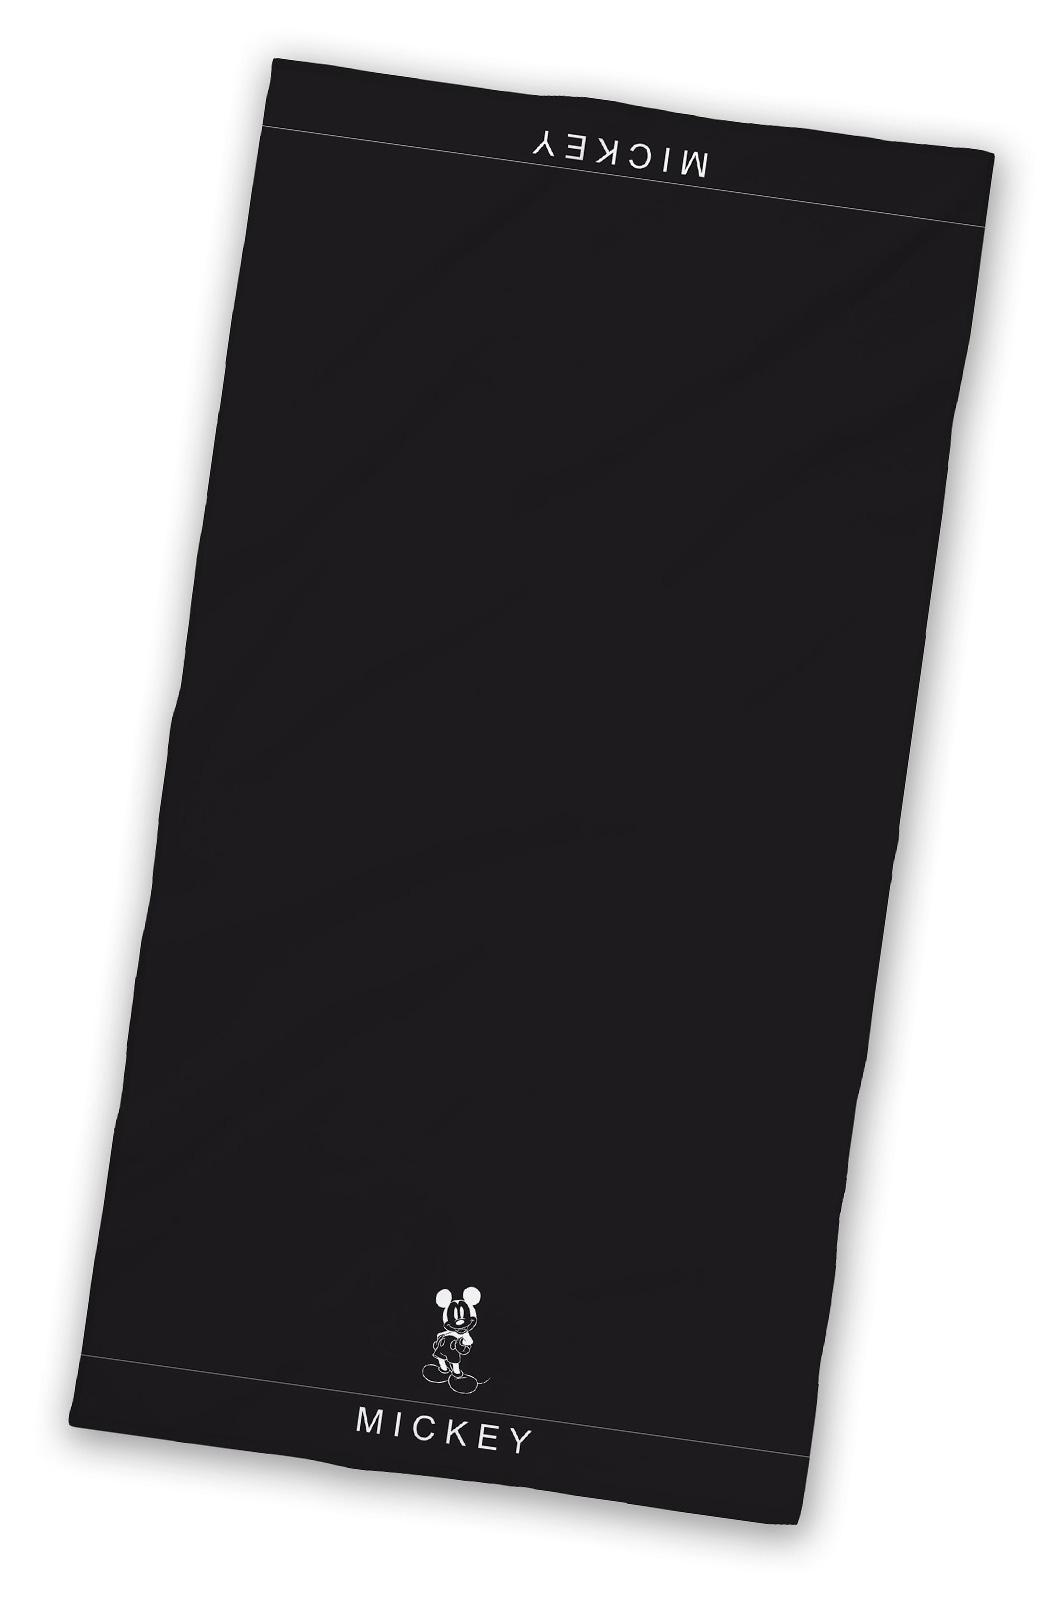 Badtextilien - Disney Frottee Duschtuch Mickey Mouse 70x140 schwarz  - Onlineshop PremiumShop321